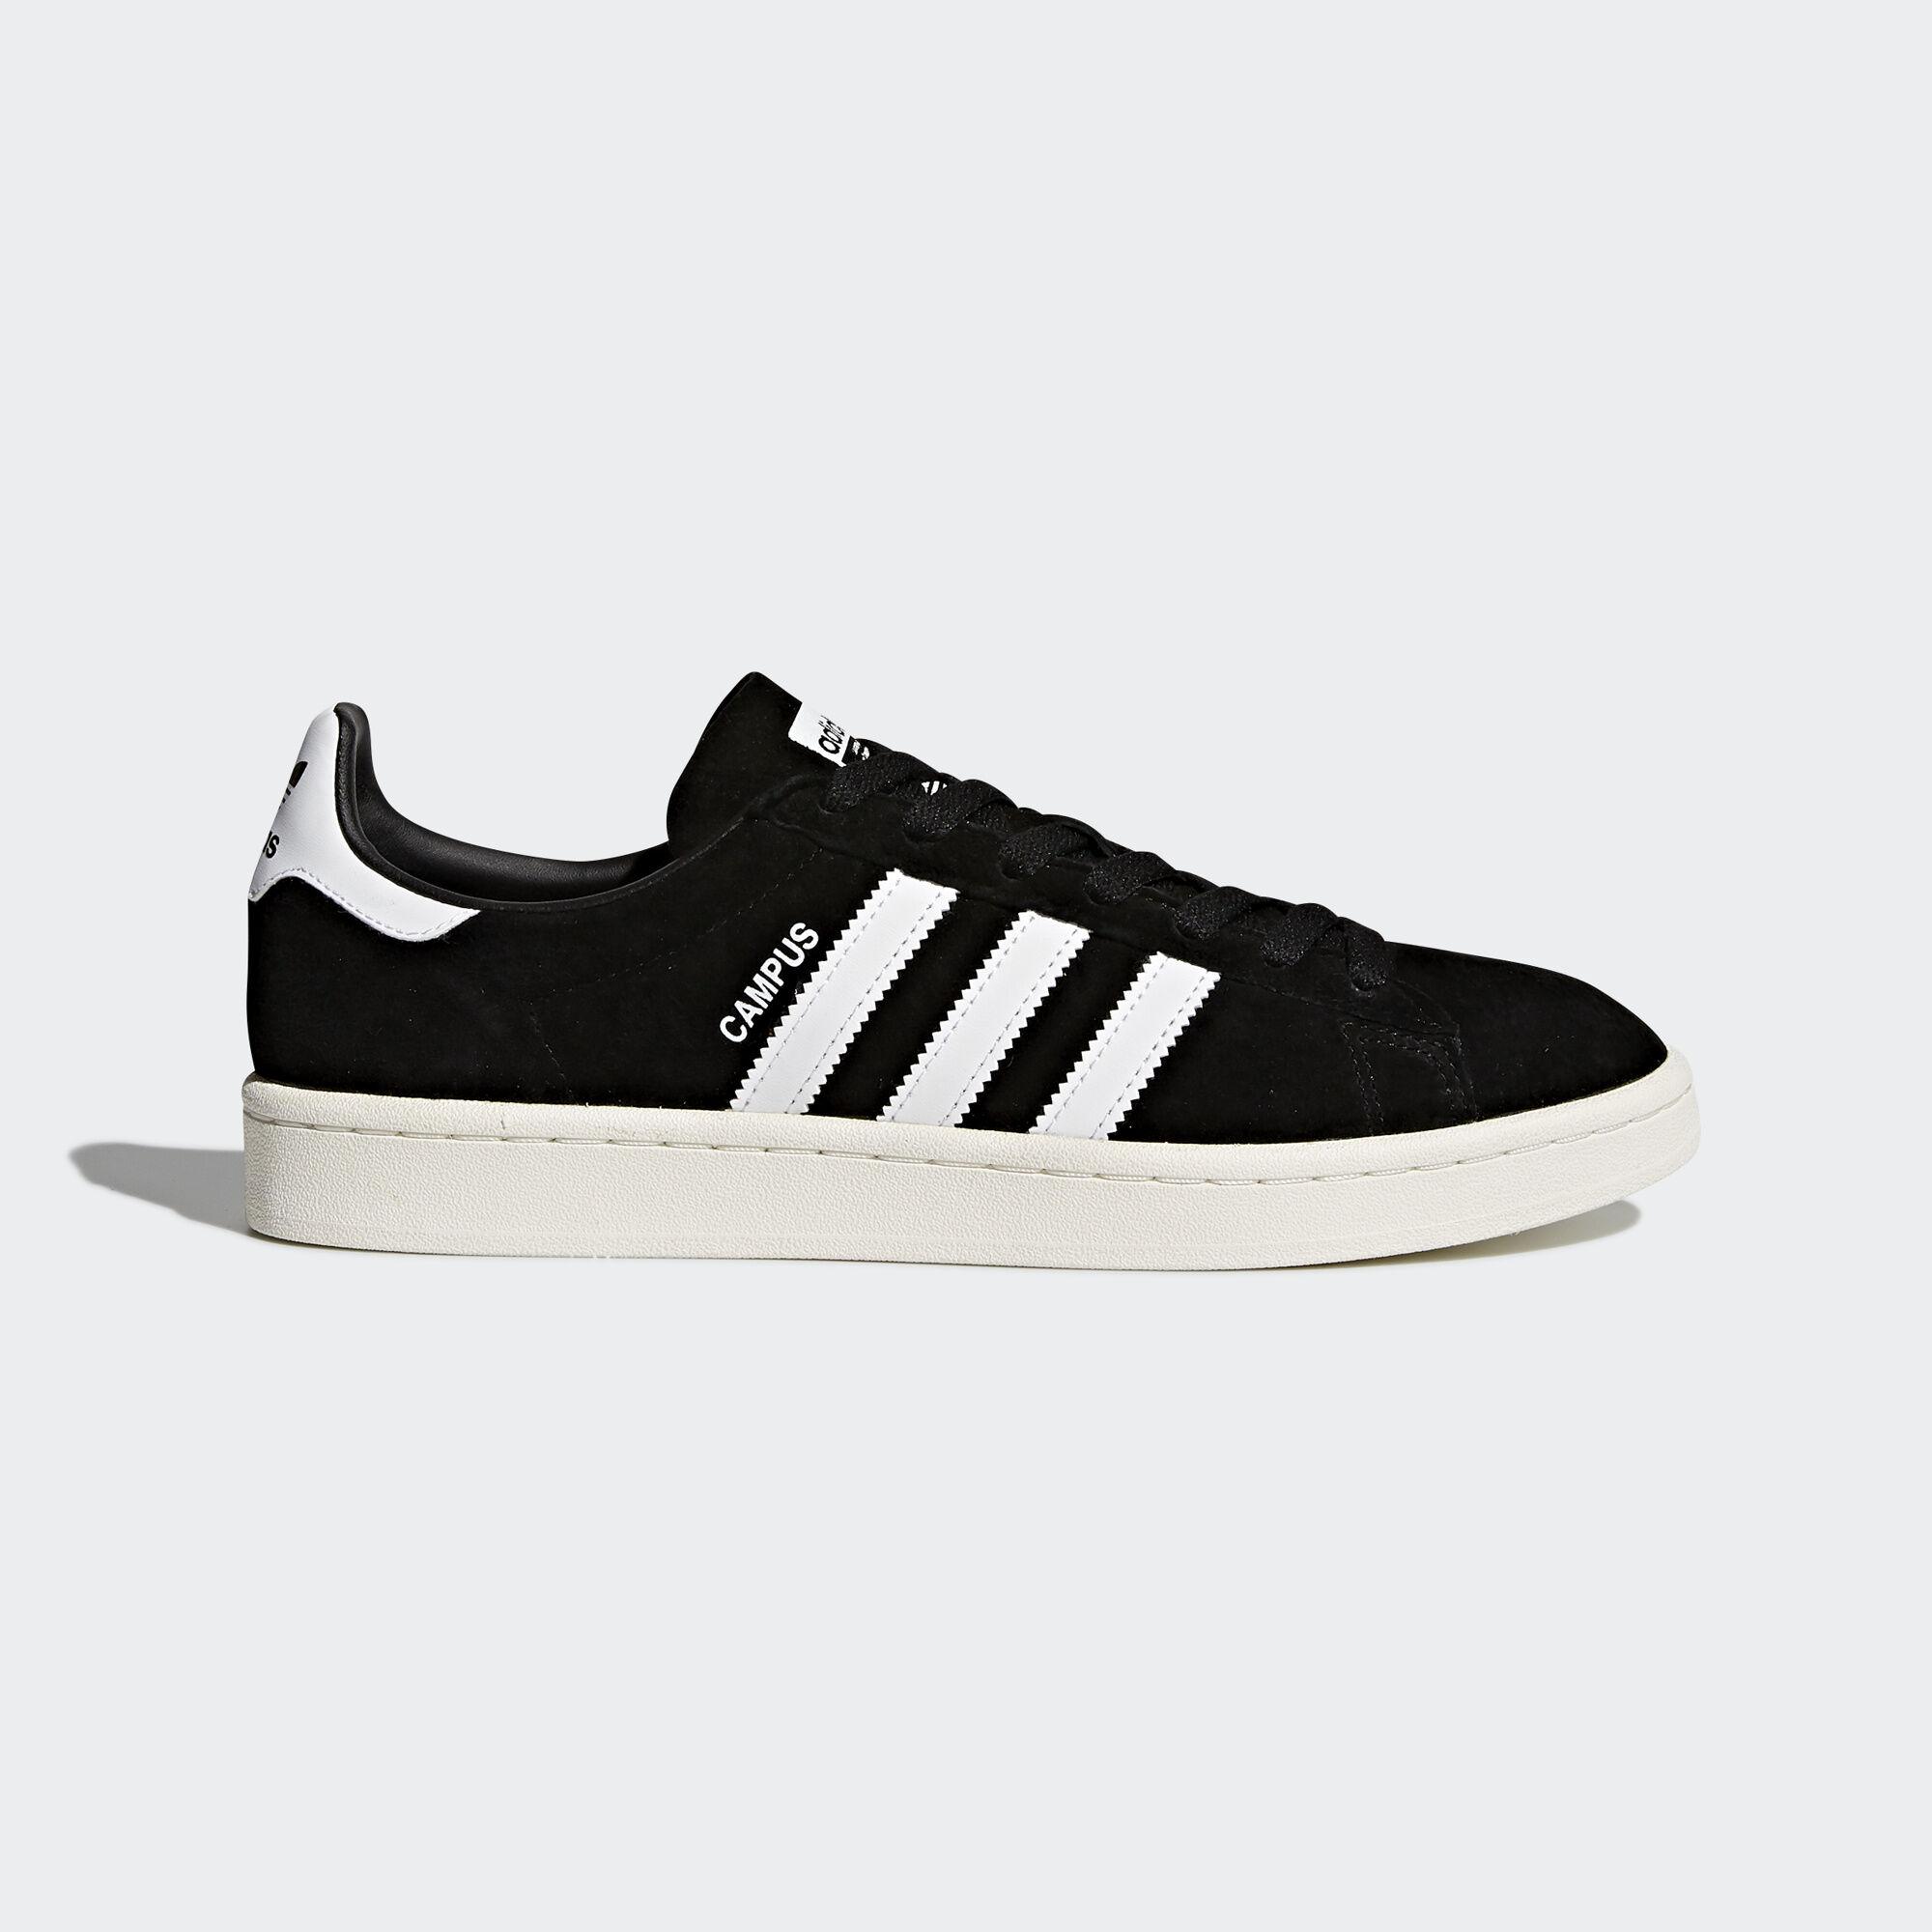 adidas - Campus Shoes Core Black/Footwear White/Chalk White BZ0084.  Originals